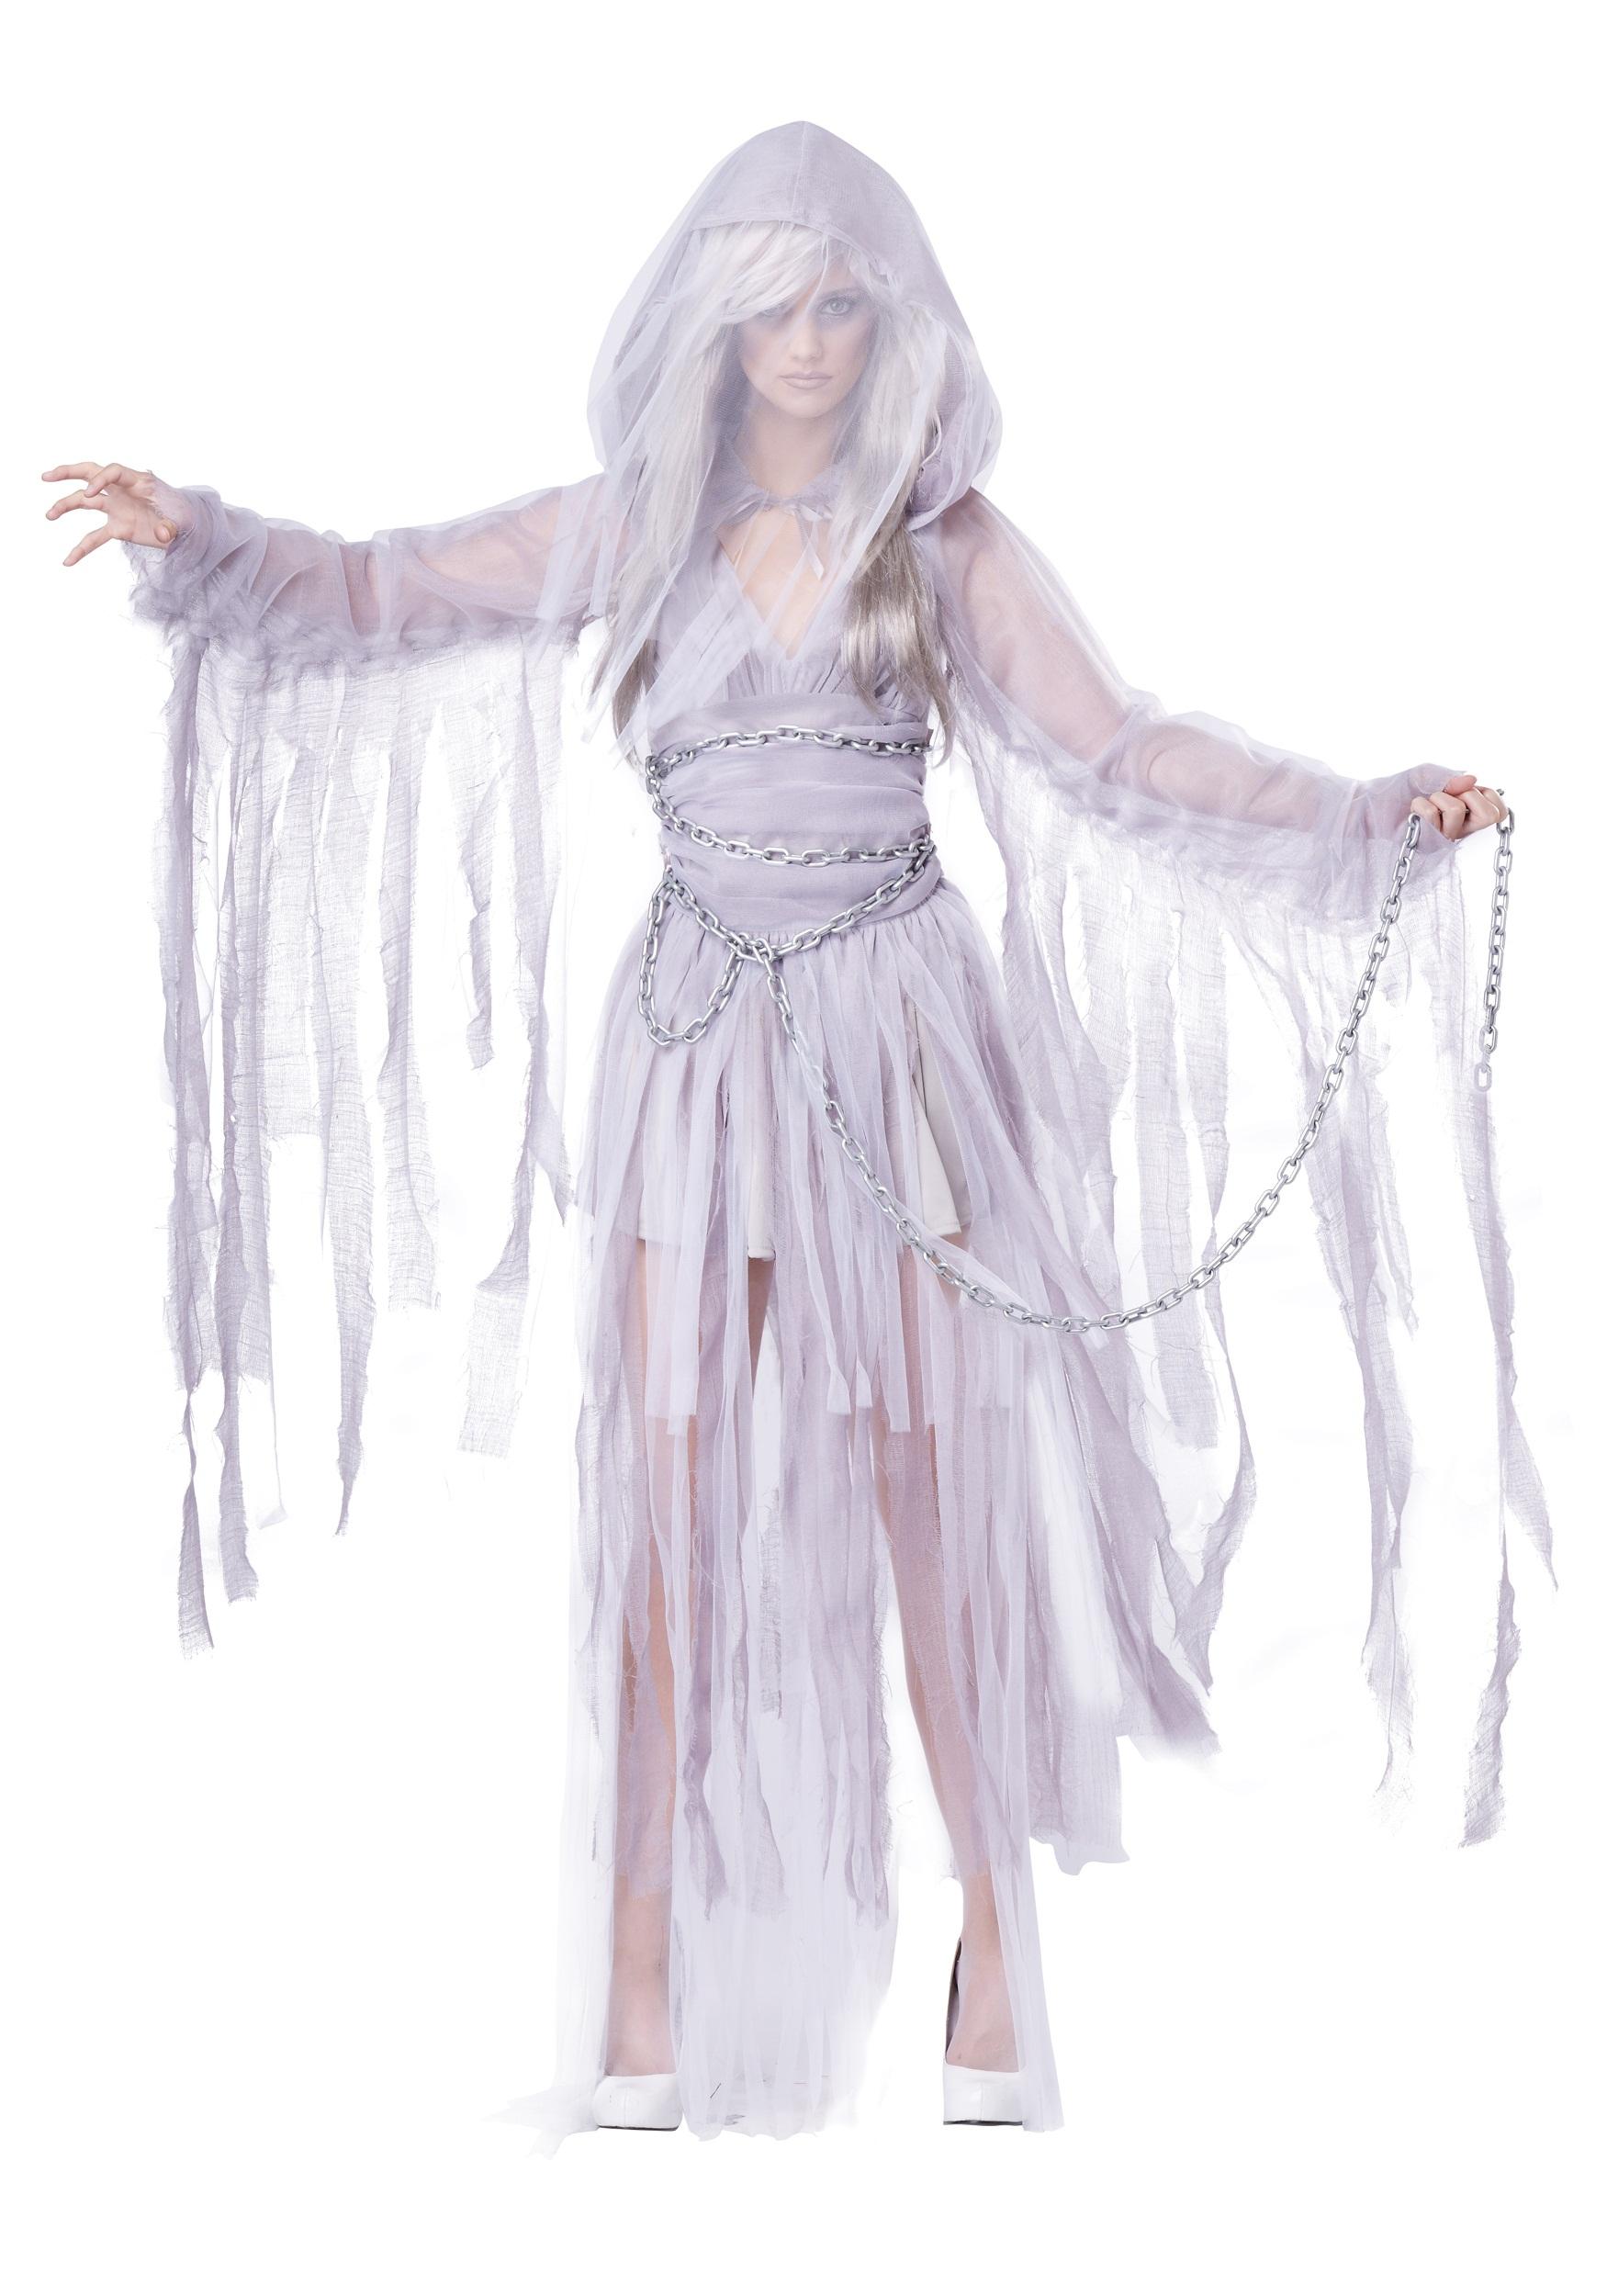 Spirit Of Christmas Past Costume.Haunting Beauty Costume For Women